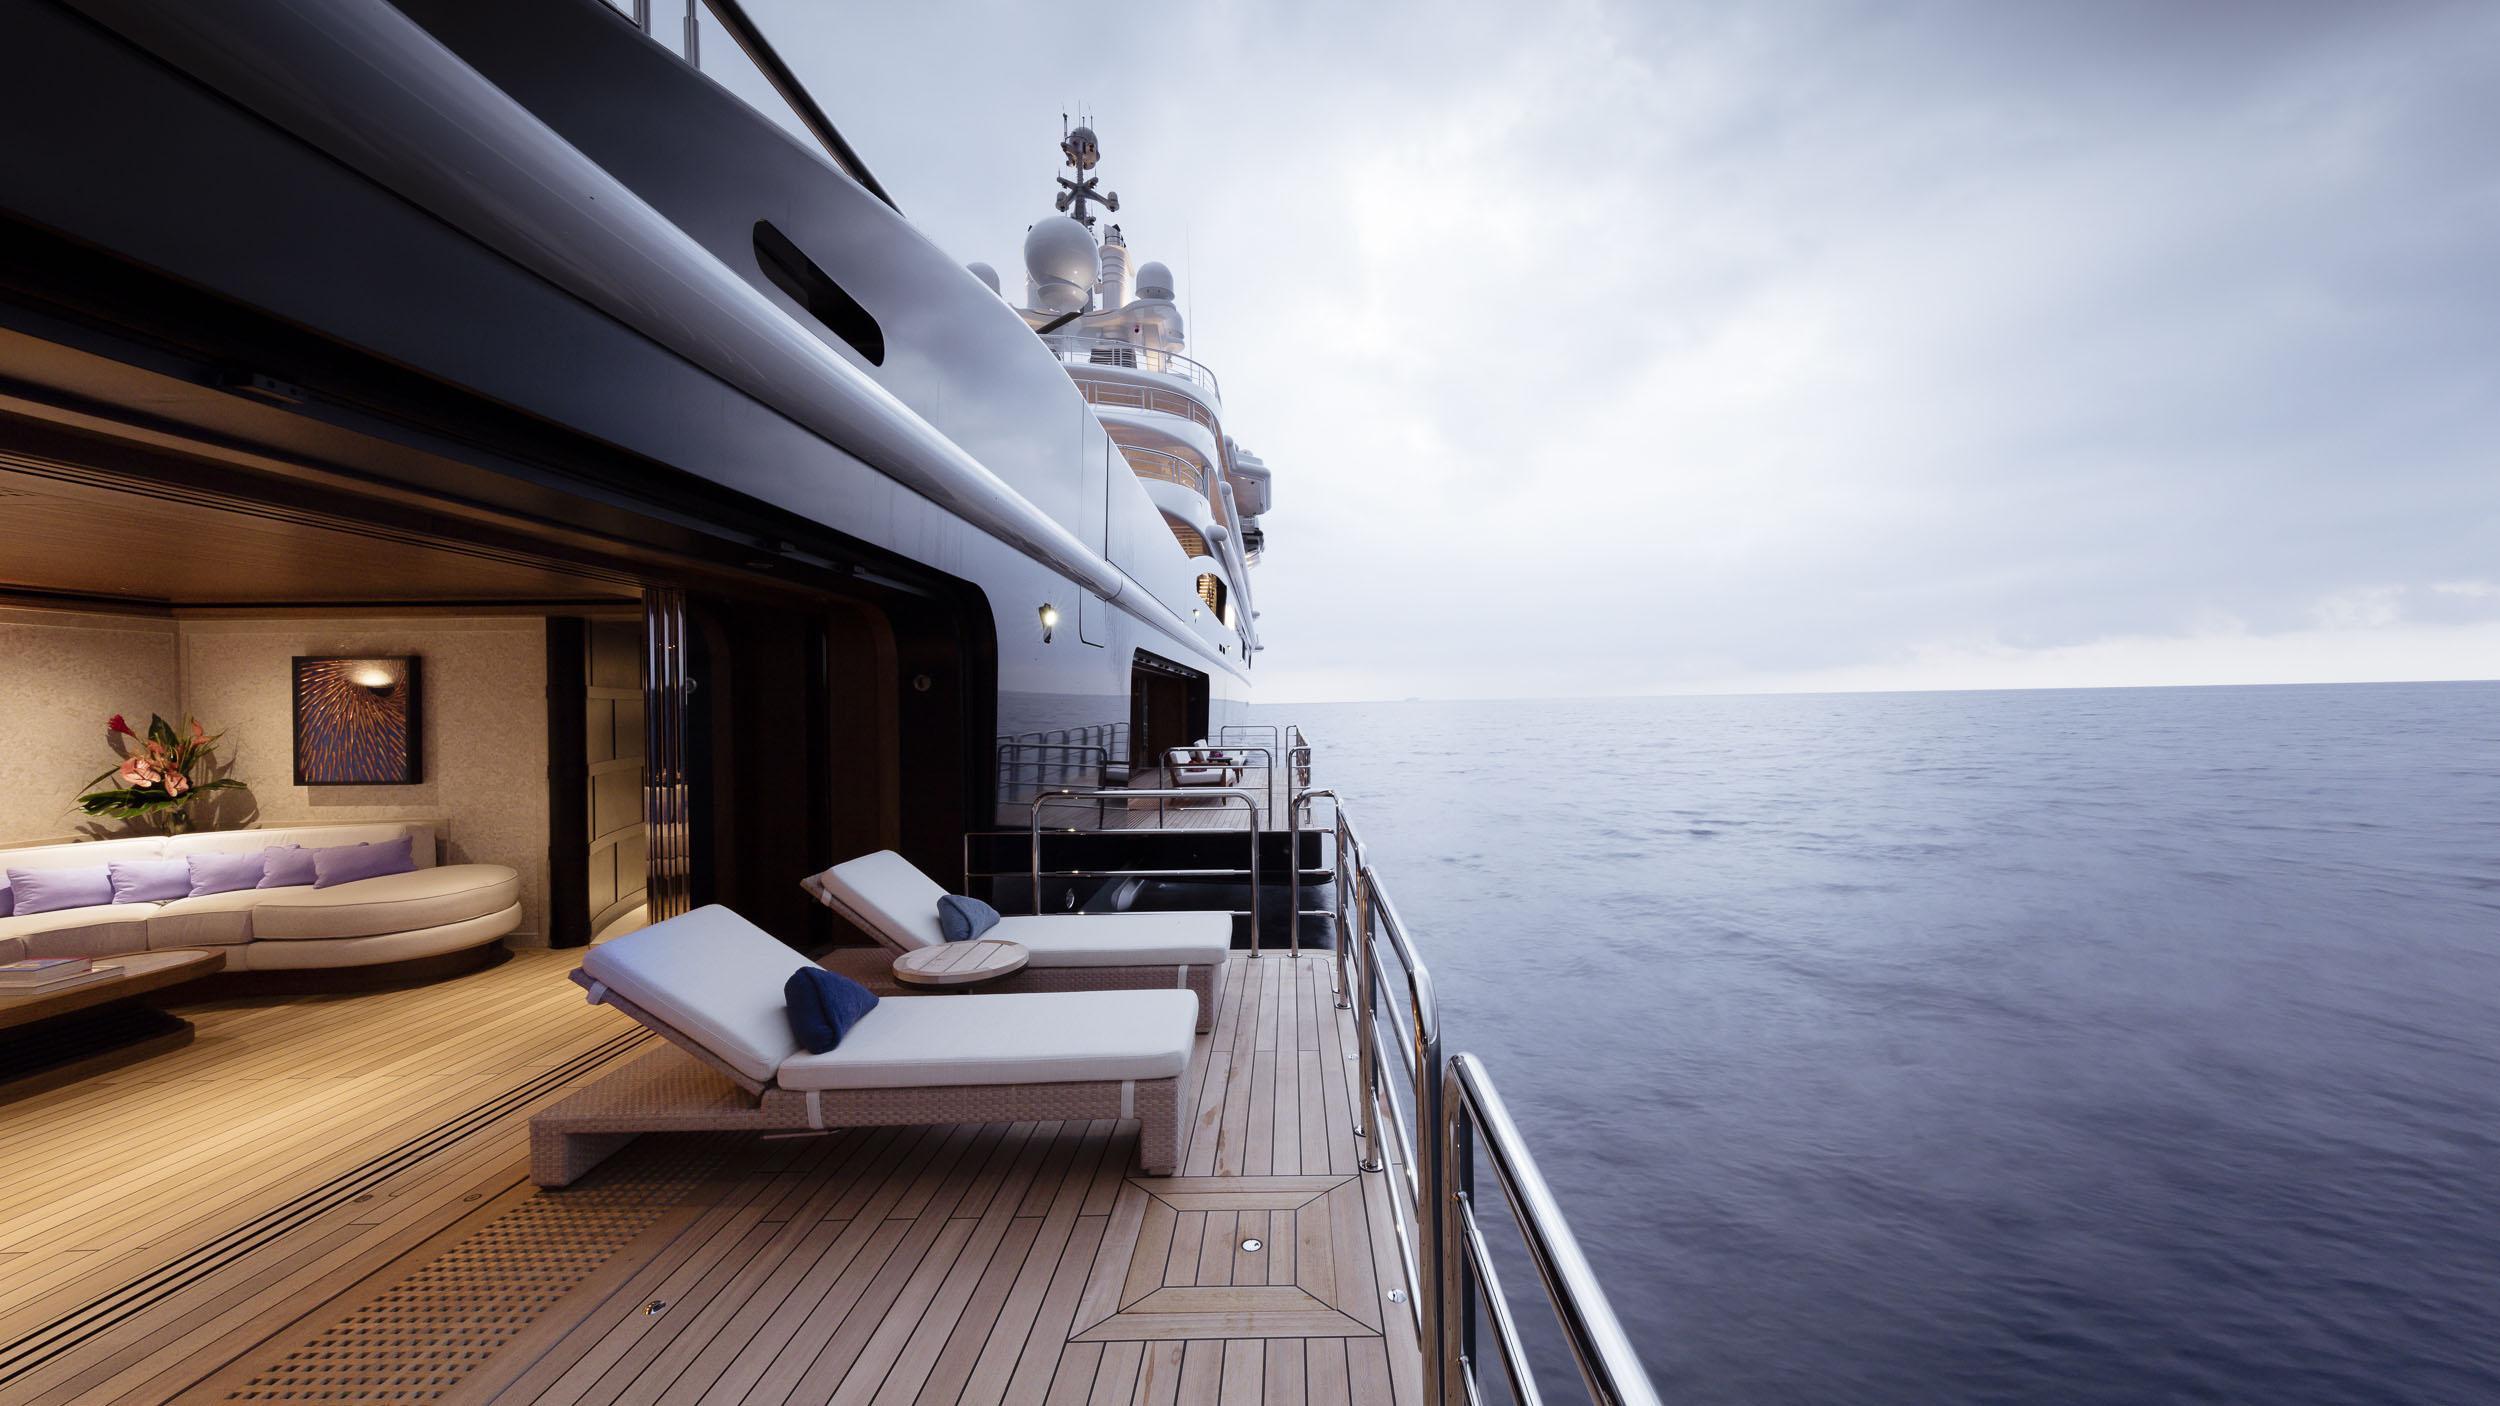 luna superyacht lloyd werft 2010 115m side balconies